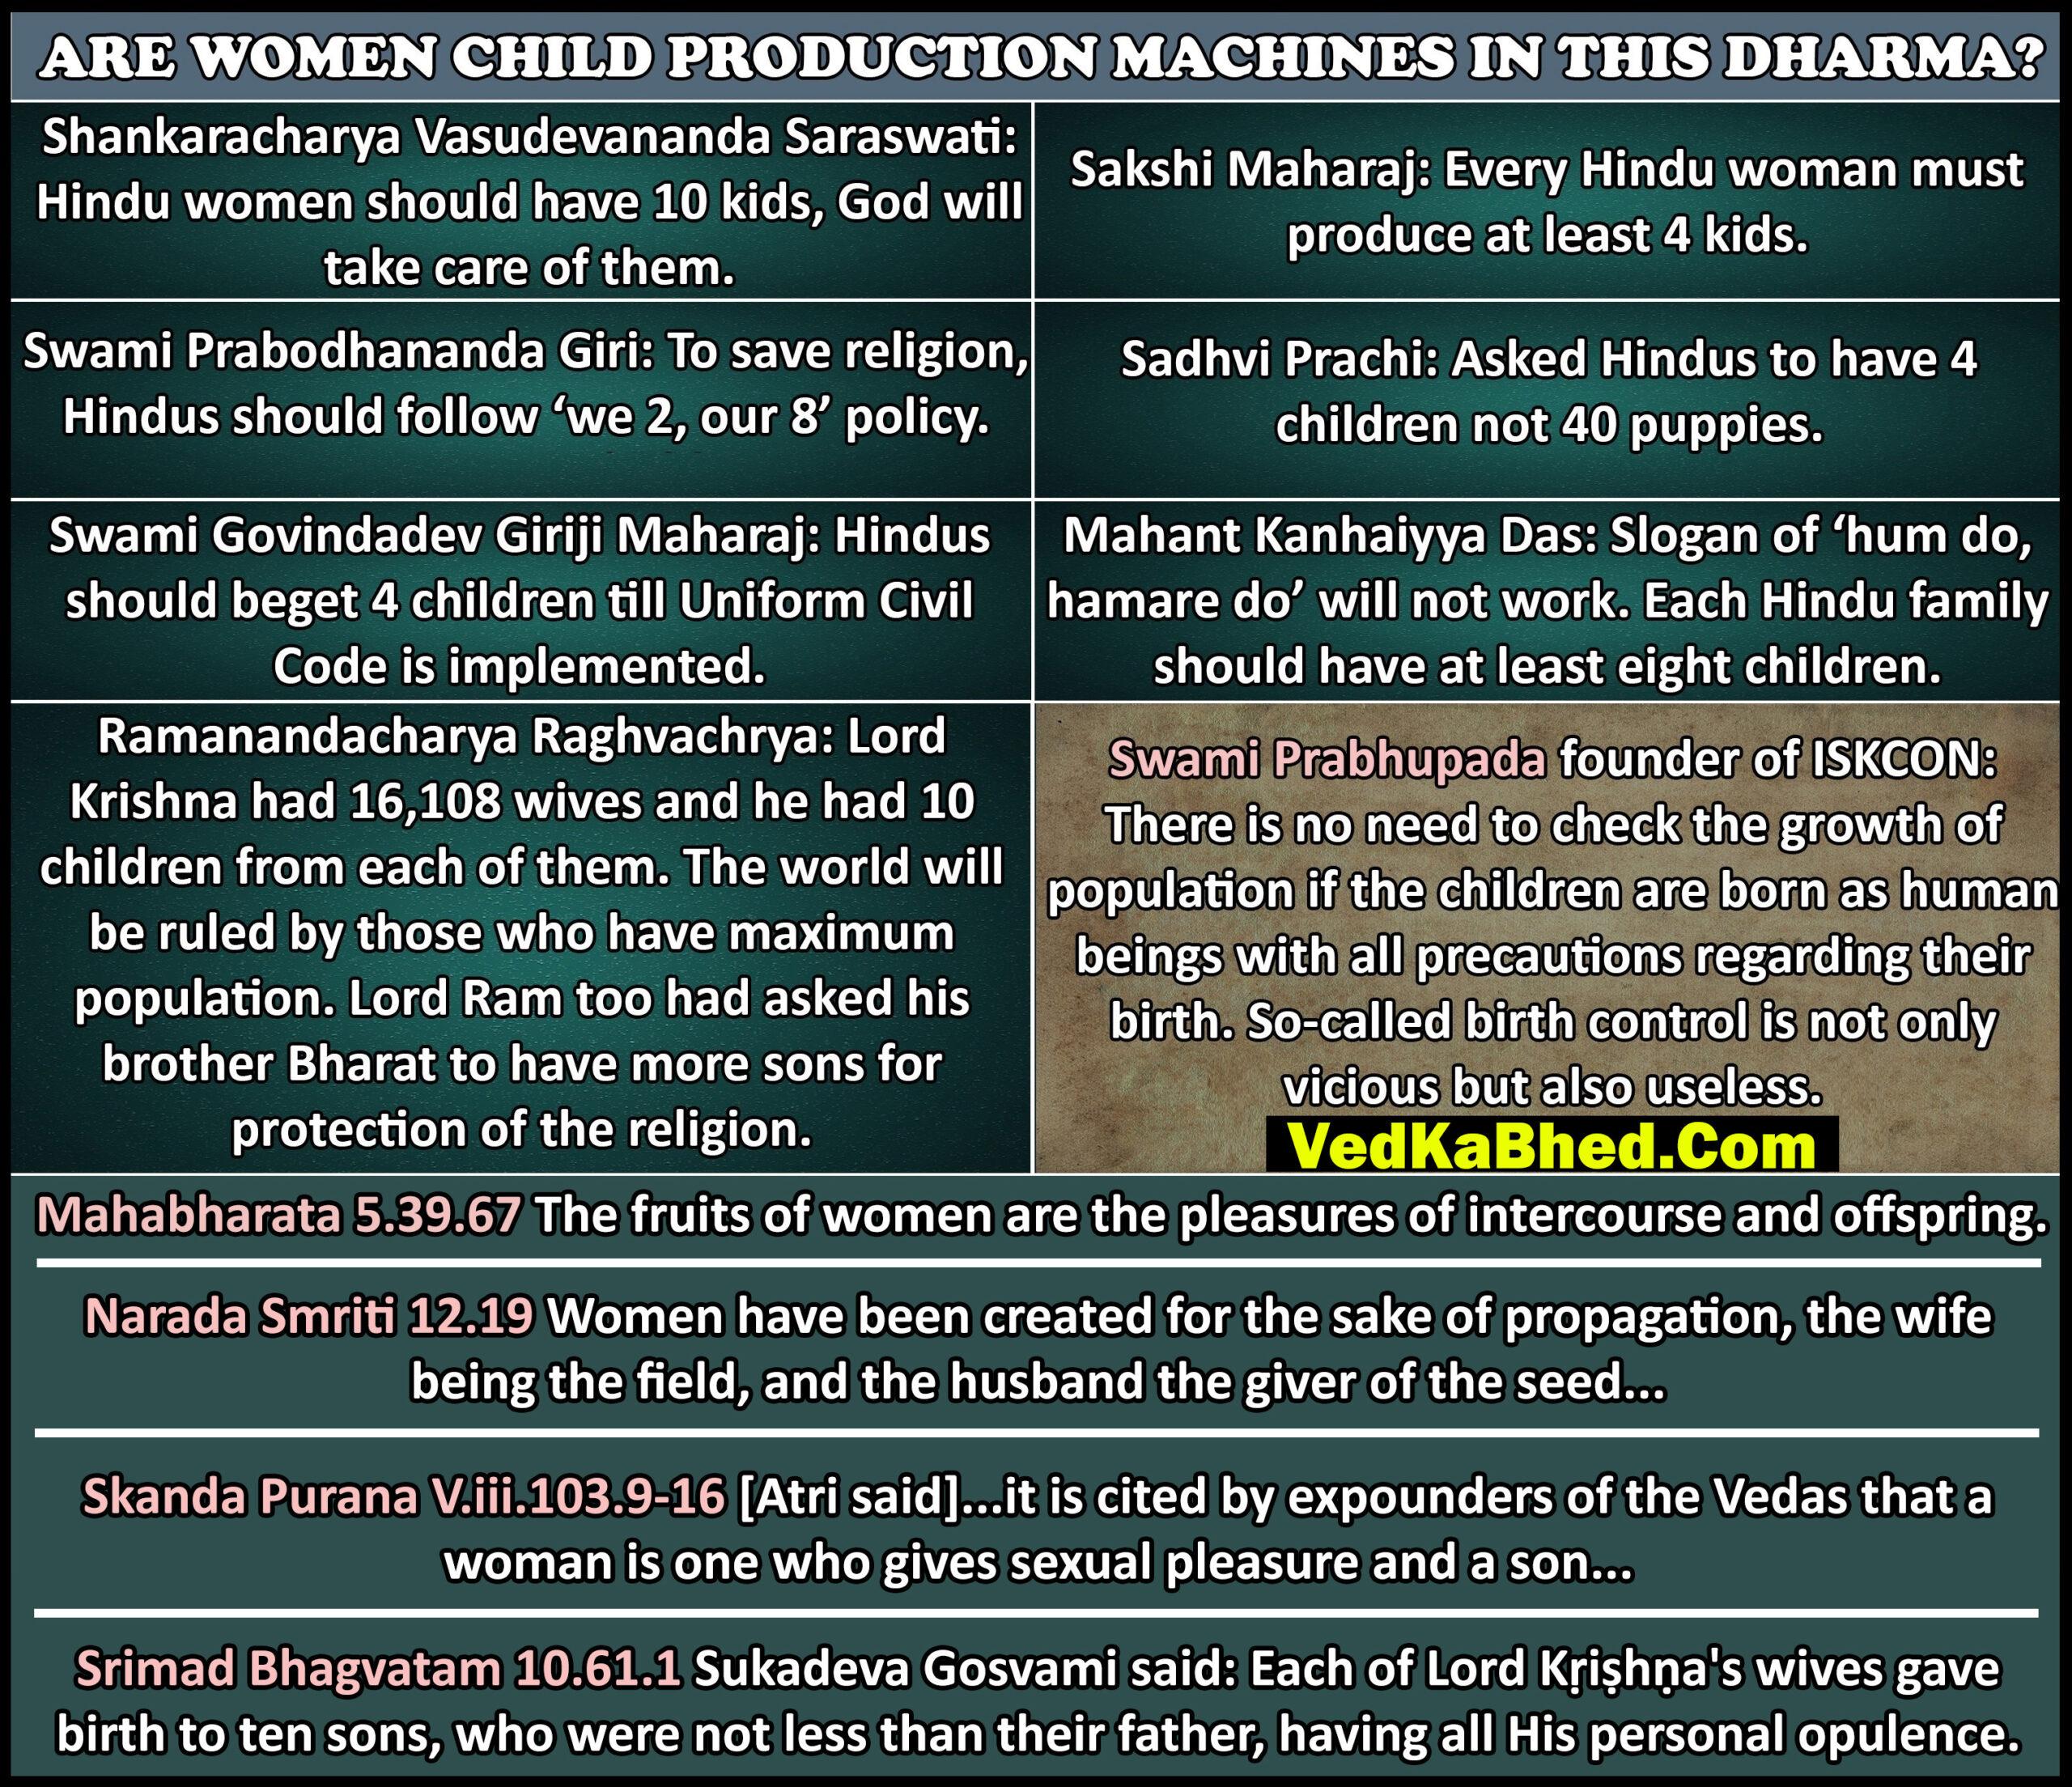 Hinduism and Overpopulation